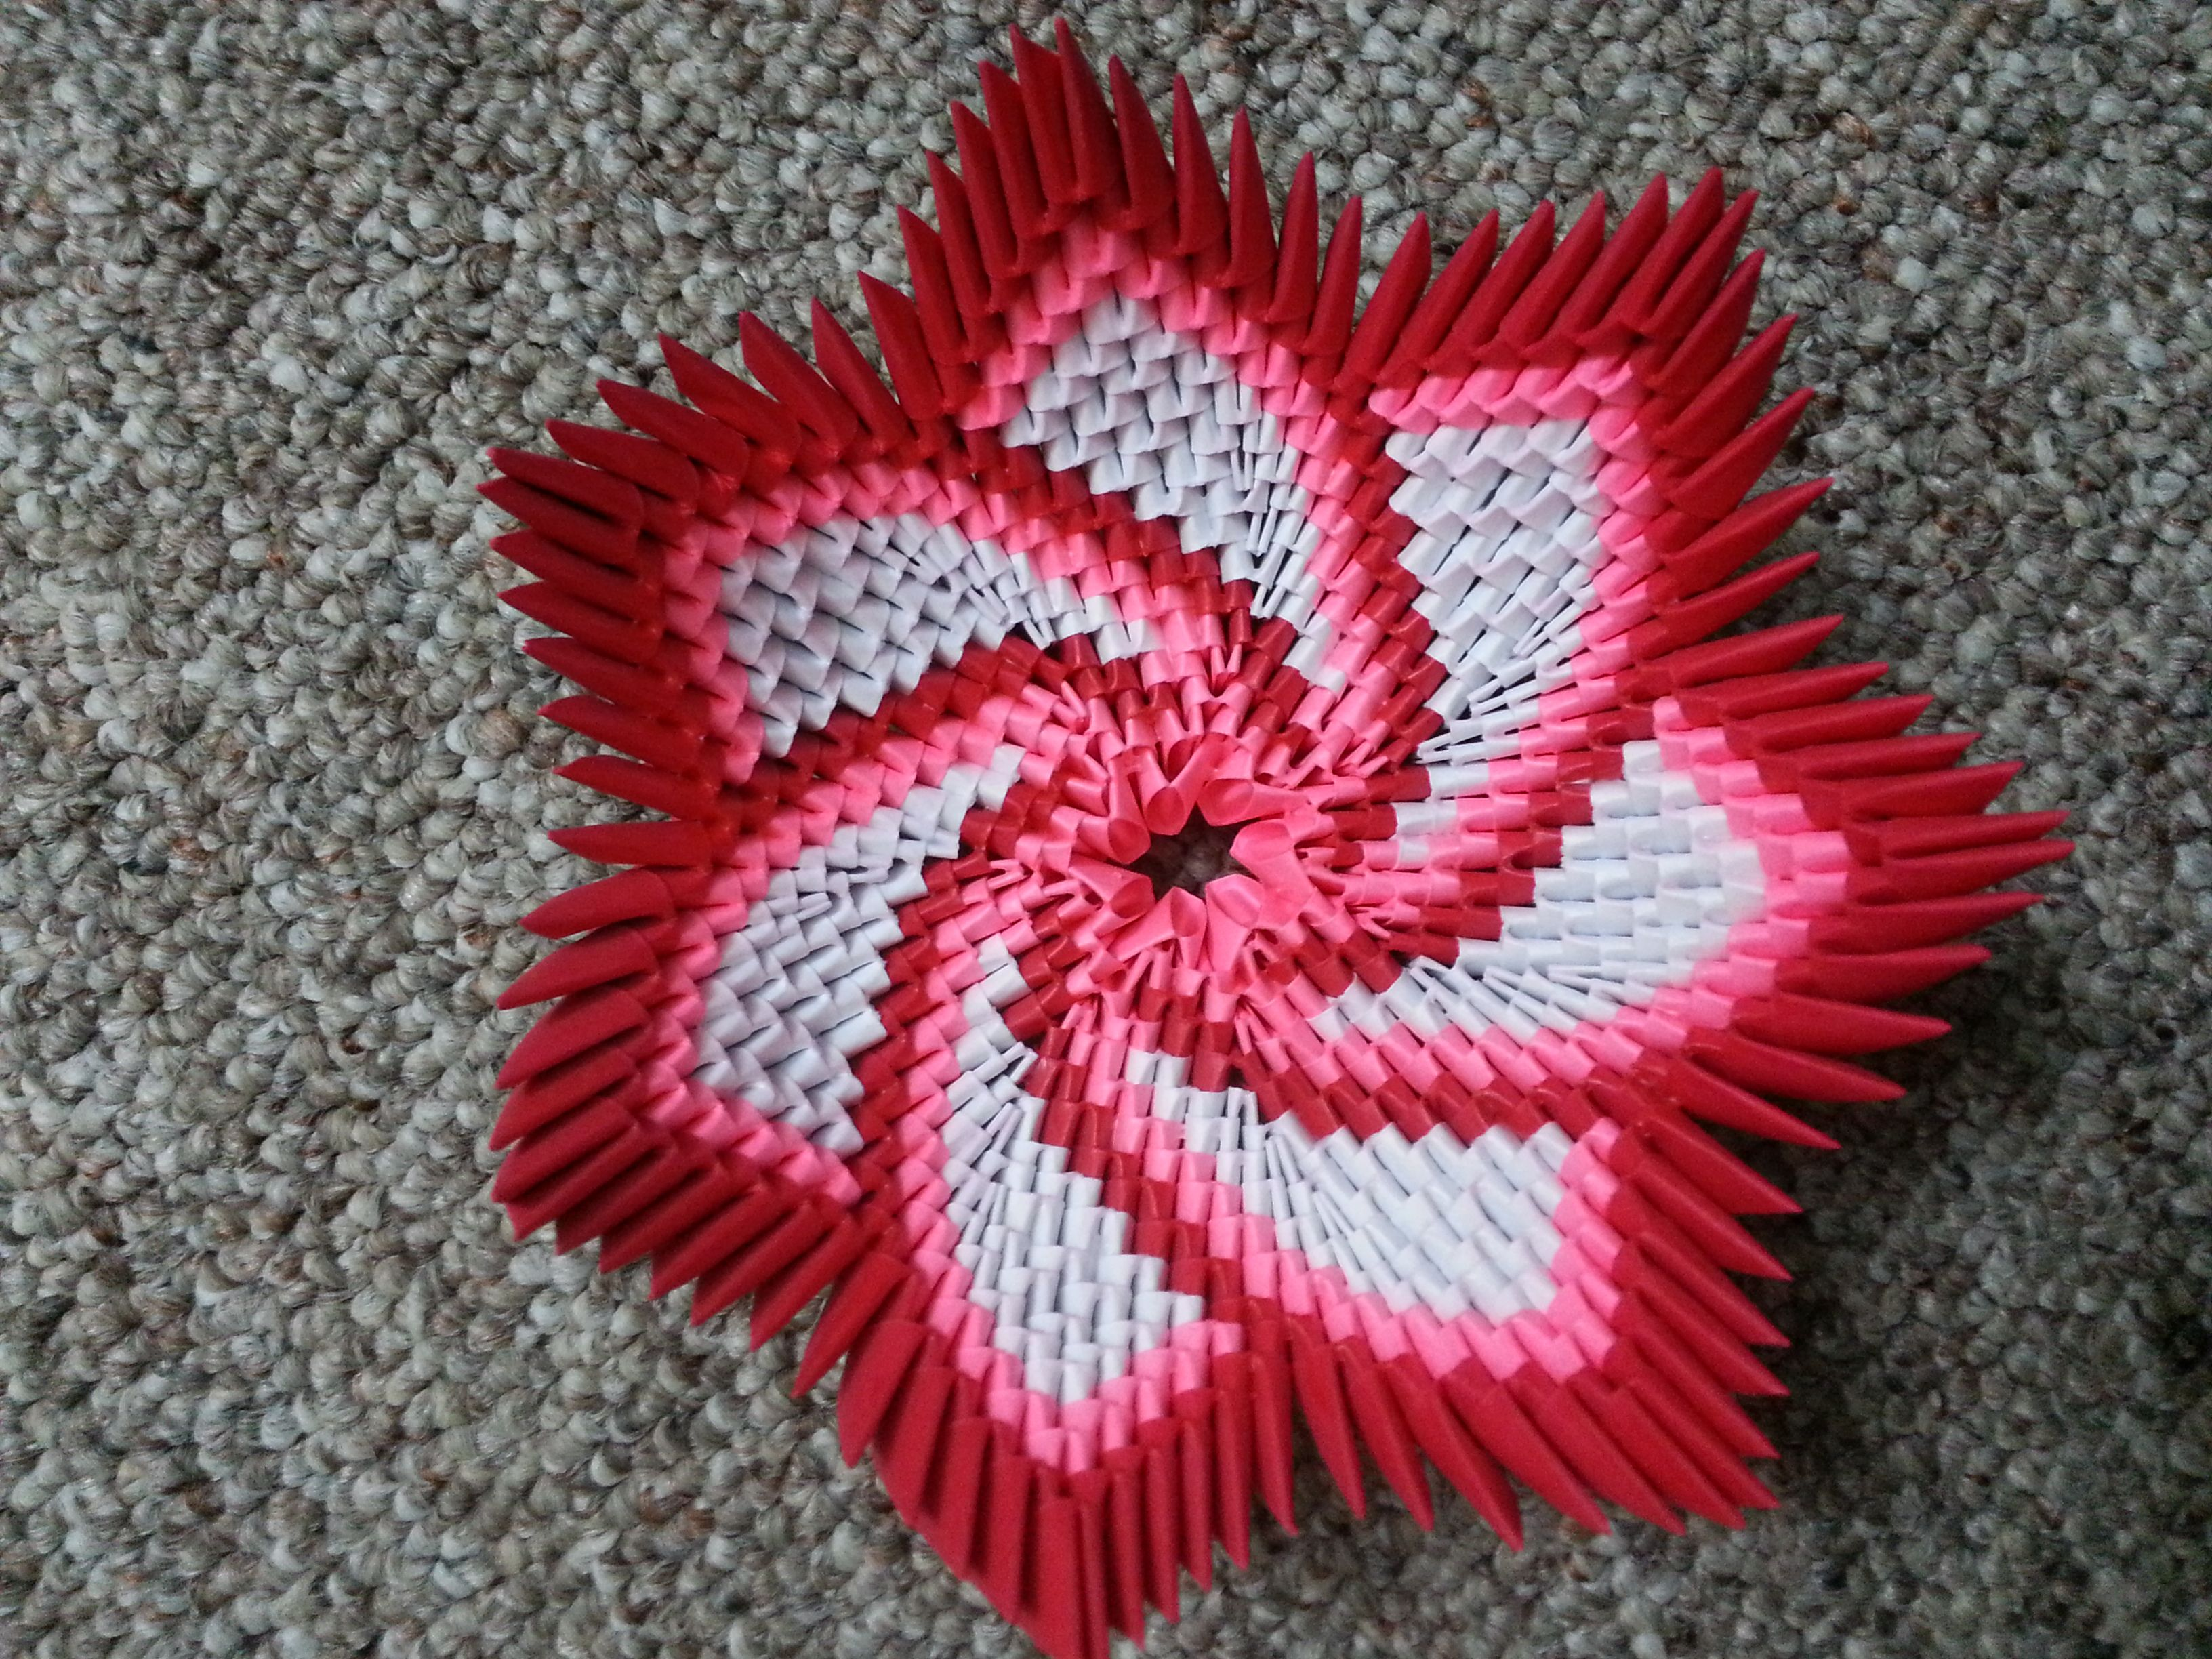 Origami spiral flower bowl httpsetsylisting origami spiral flower bowl httpsetsylisting jeuxipadfo Images